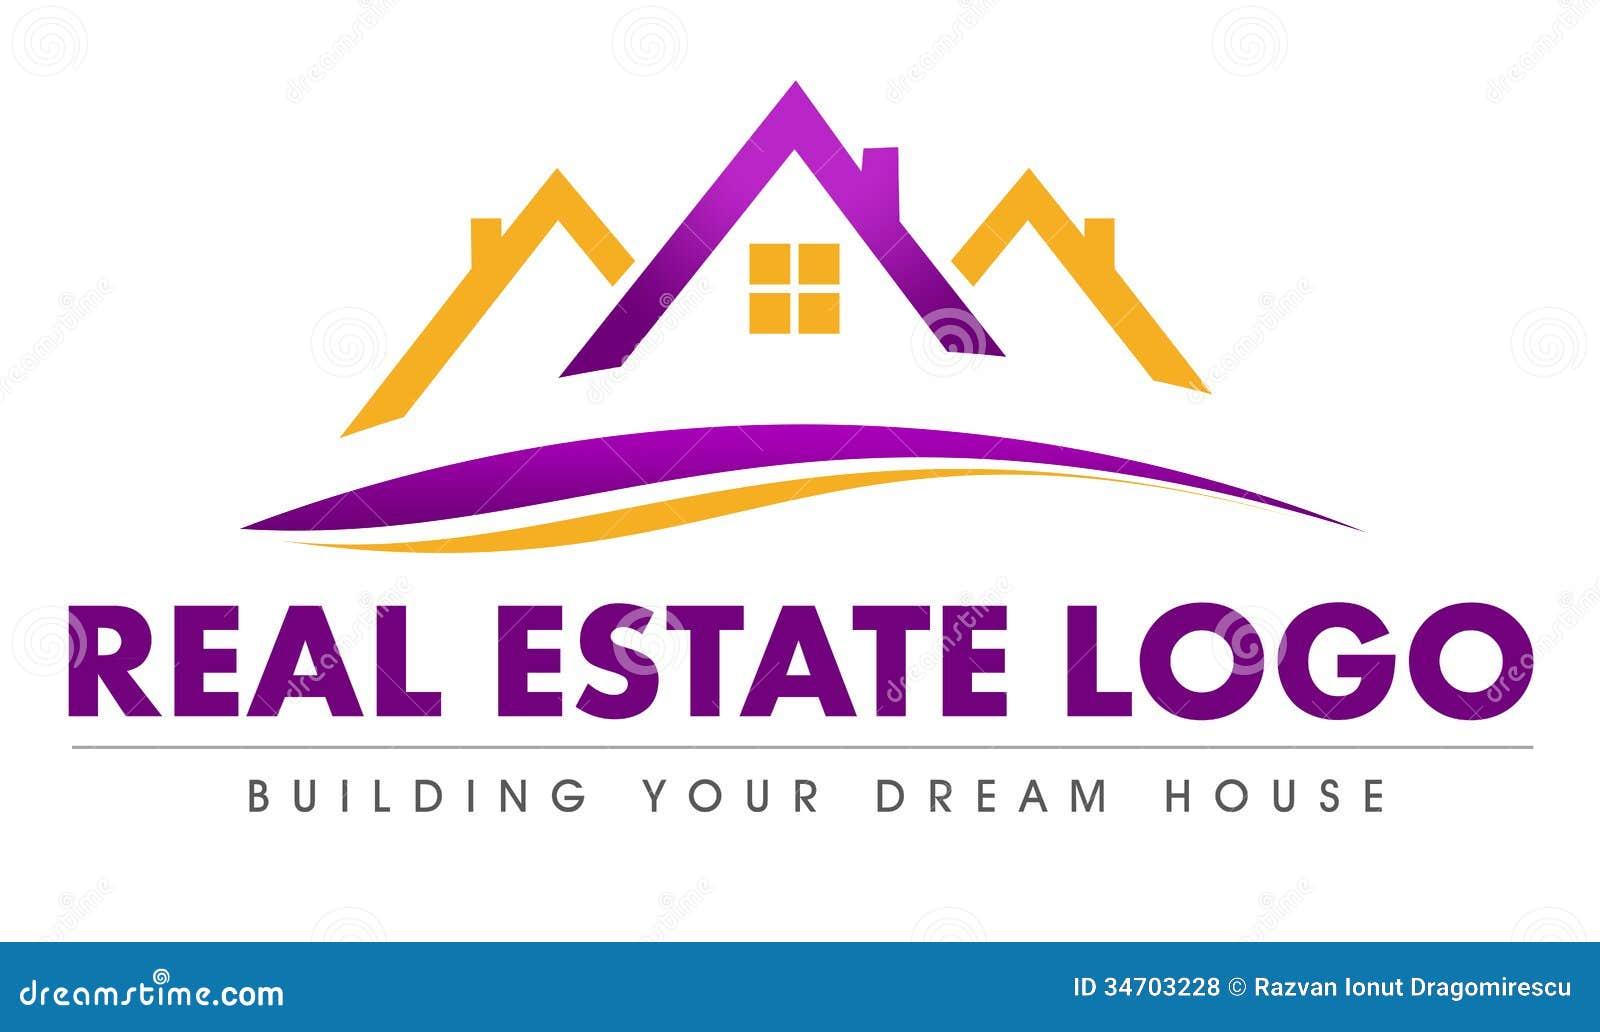 Real Estate logo templates Vector  Free Download